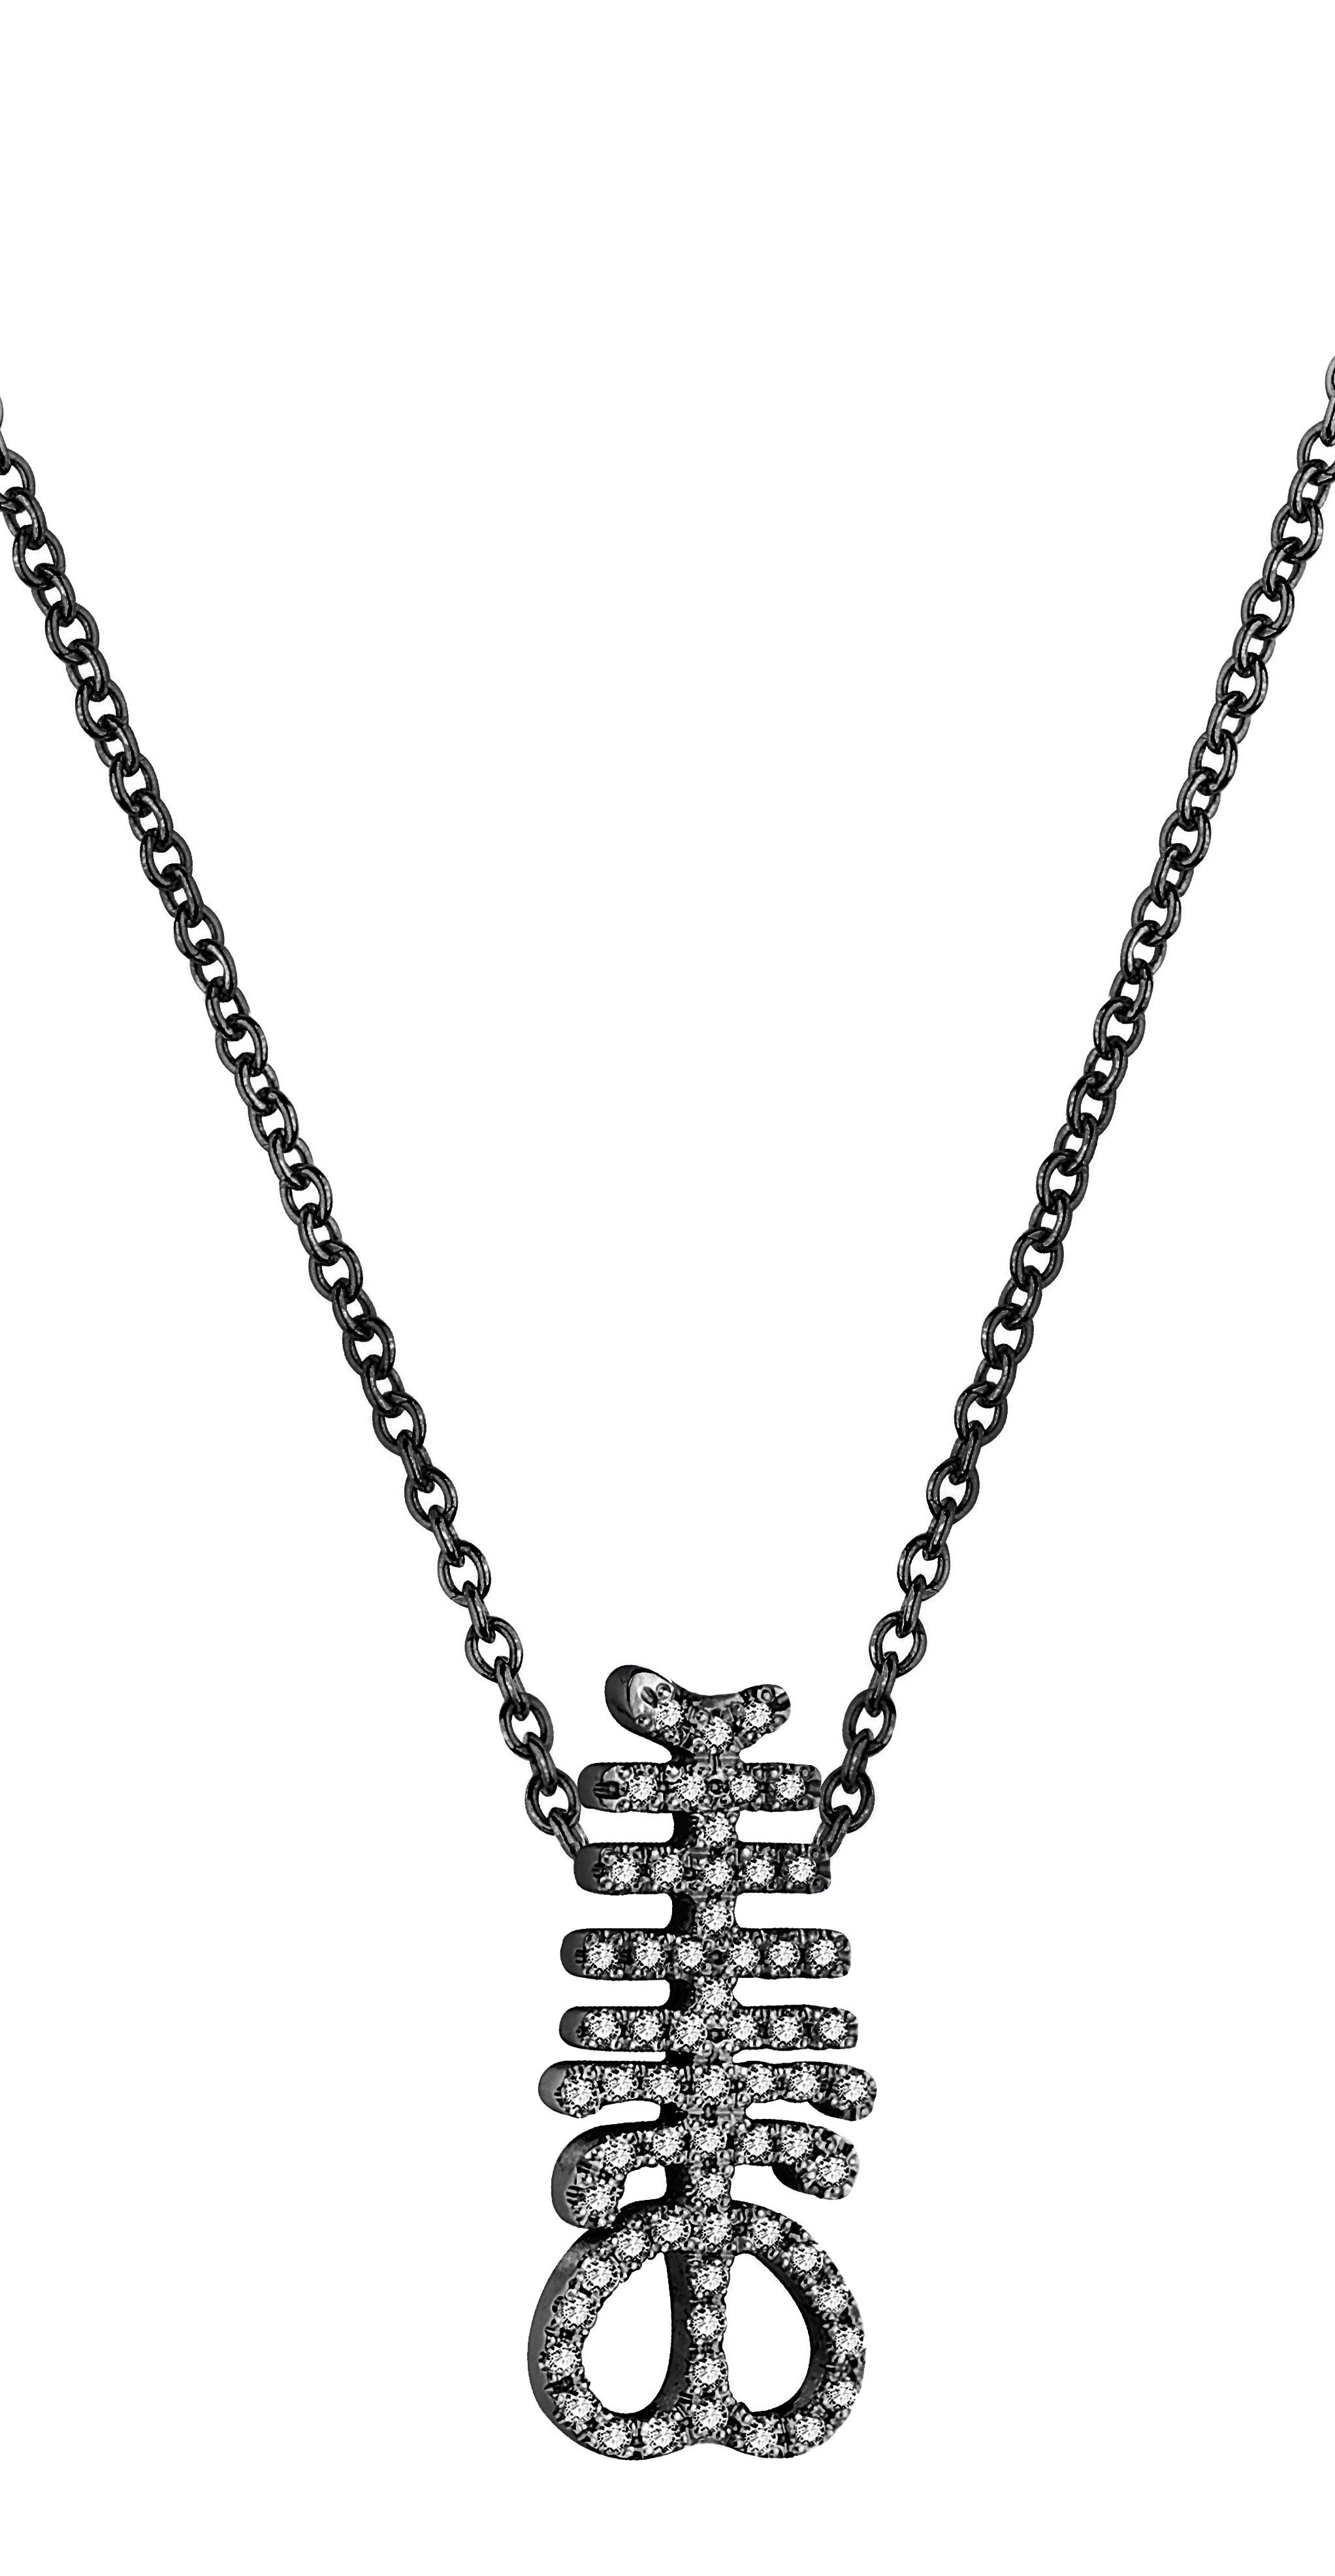 Force Bakwani7 Or diamants – Collier